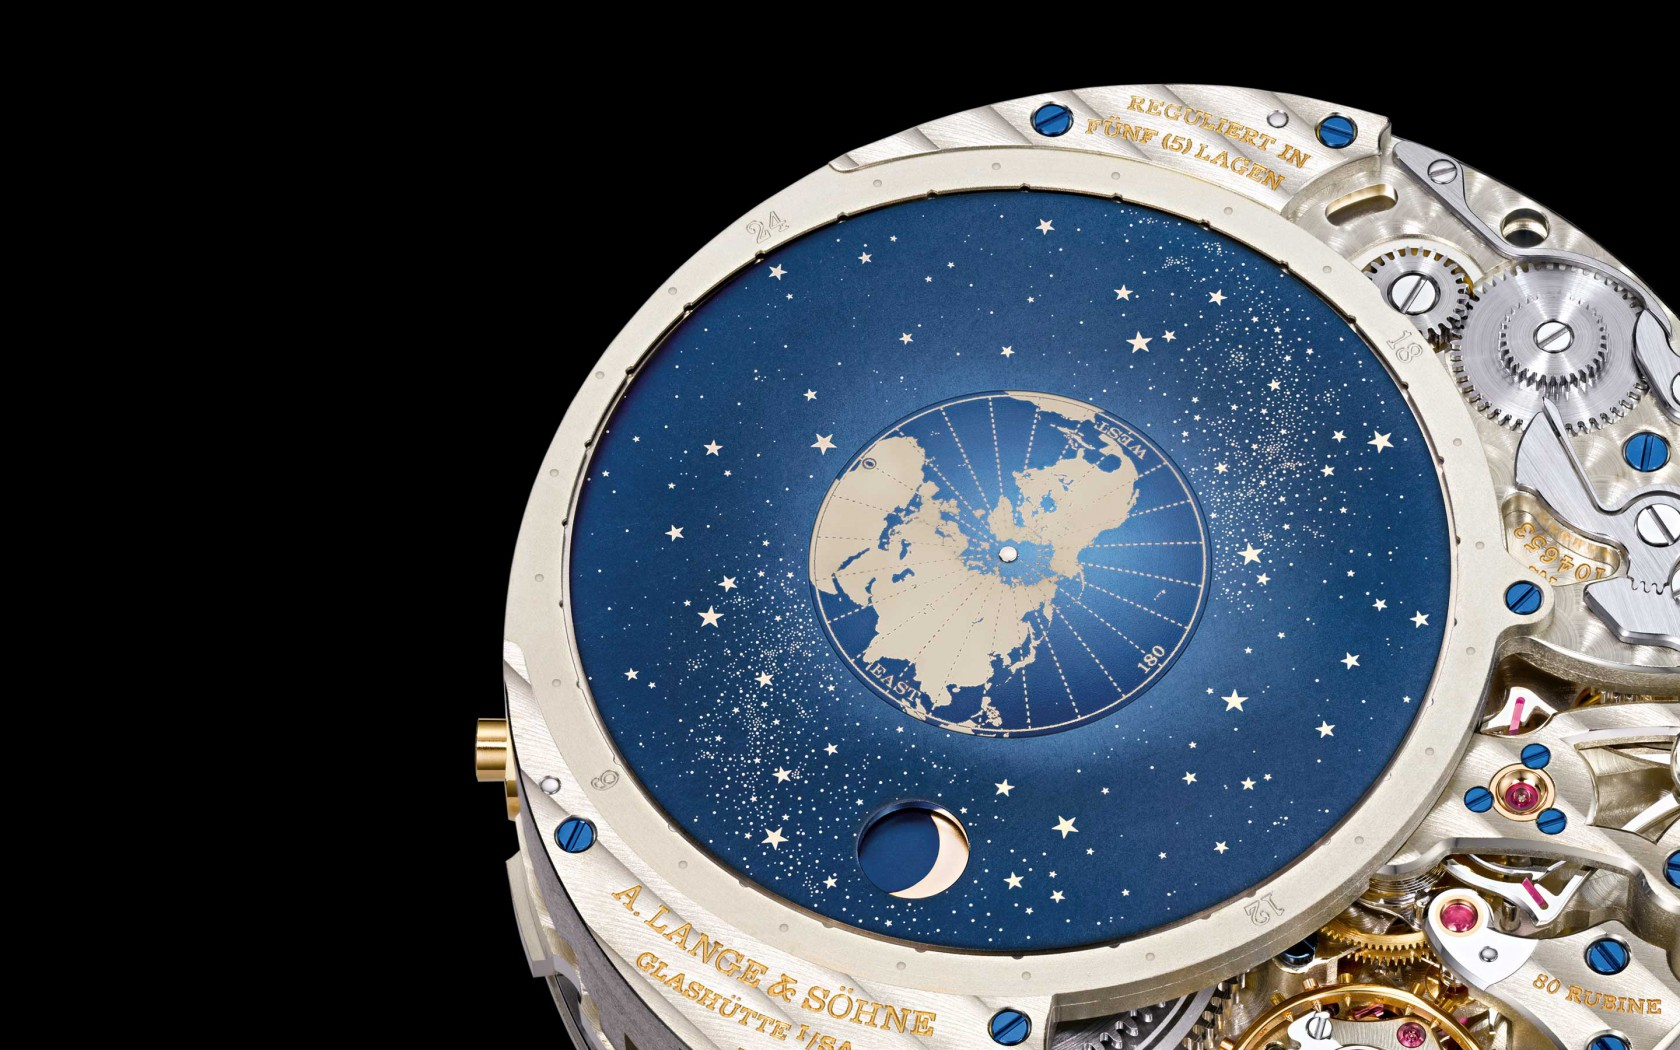 SetWidth1680-Lange-Richard-Lange-Ewiger-Kalender-Terraluna-Perpetual-Calendar-B3